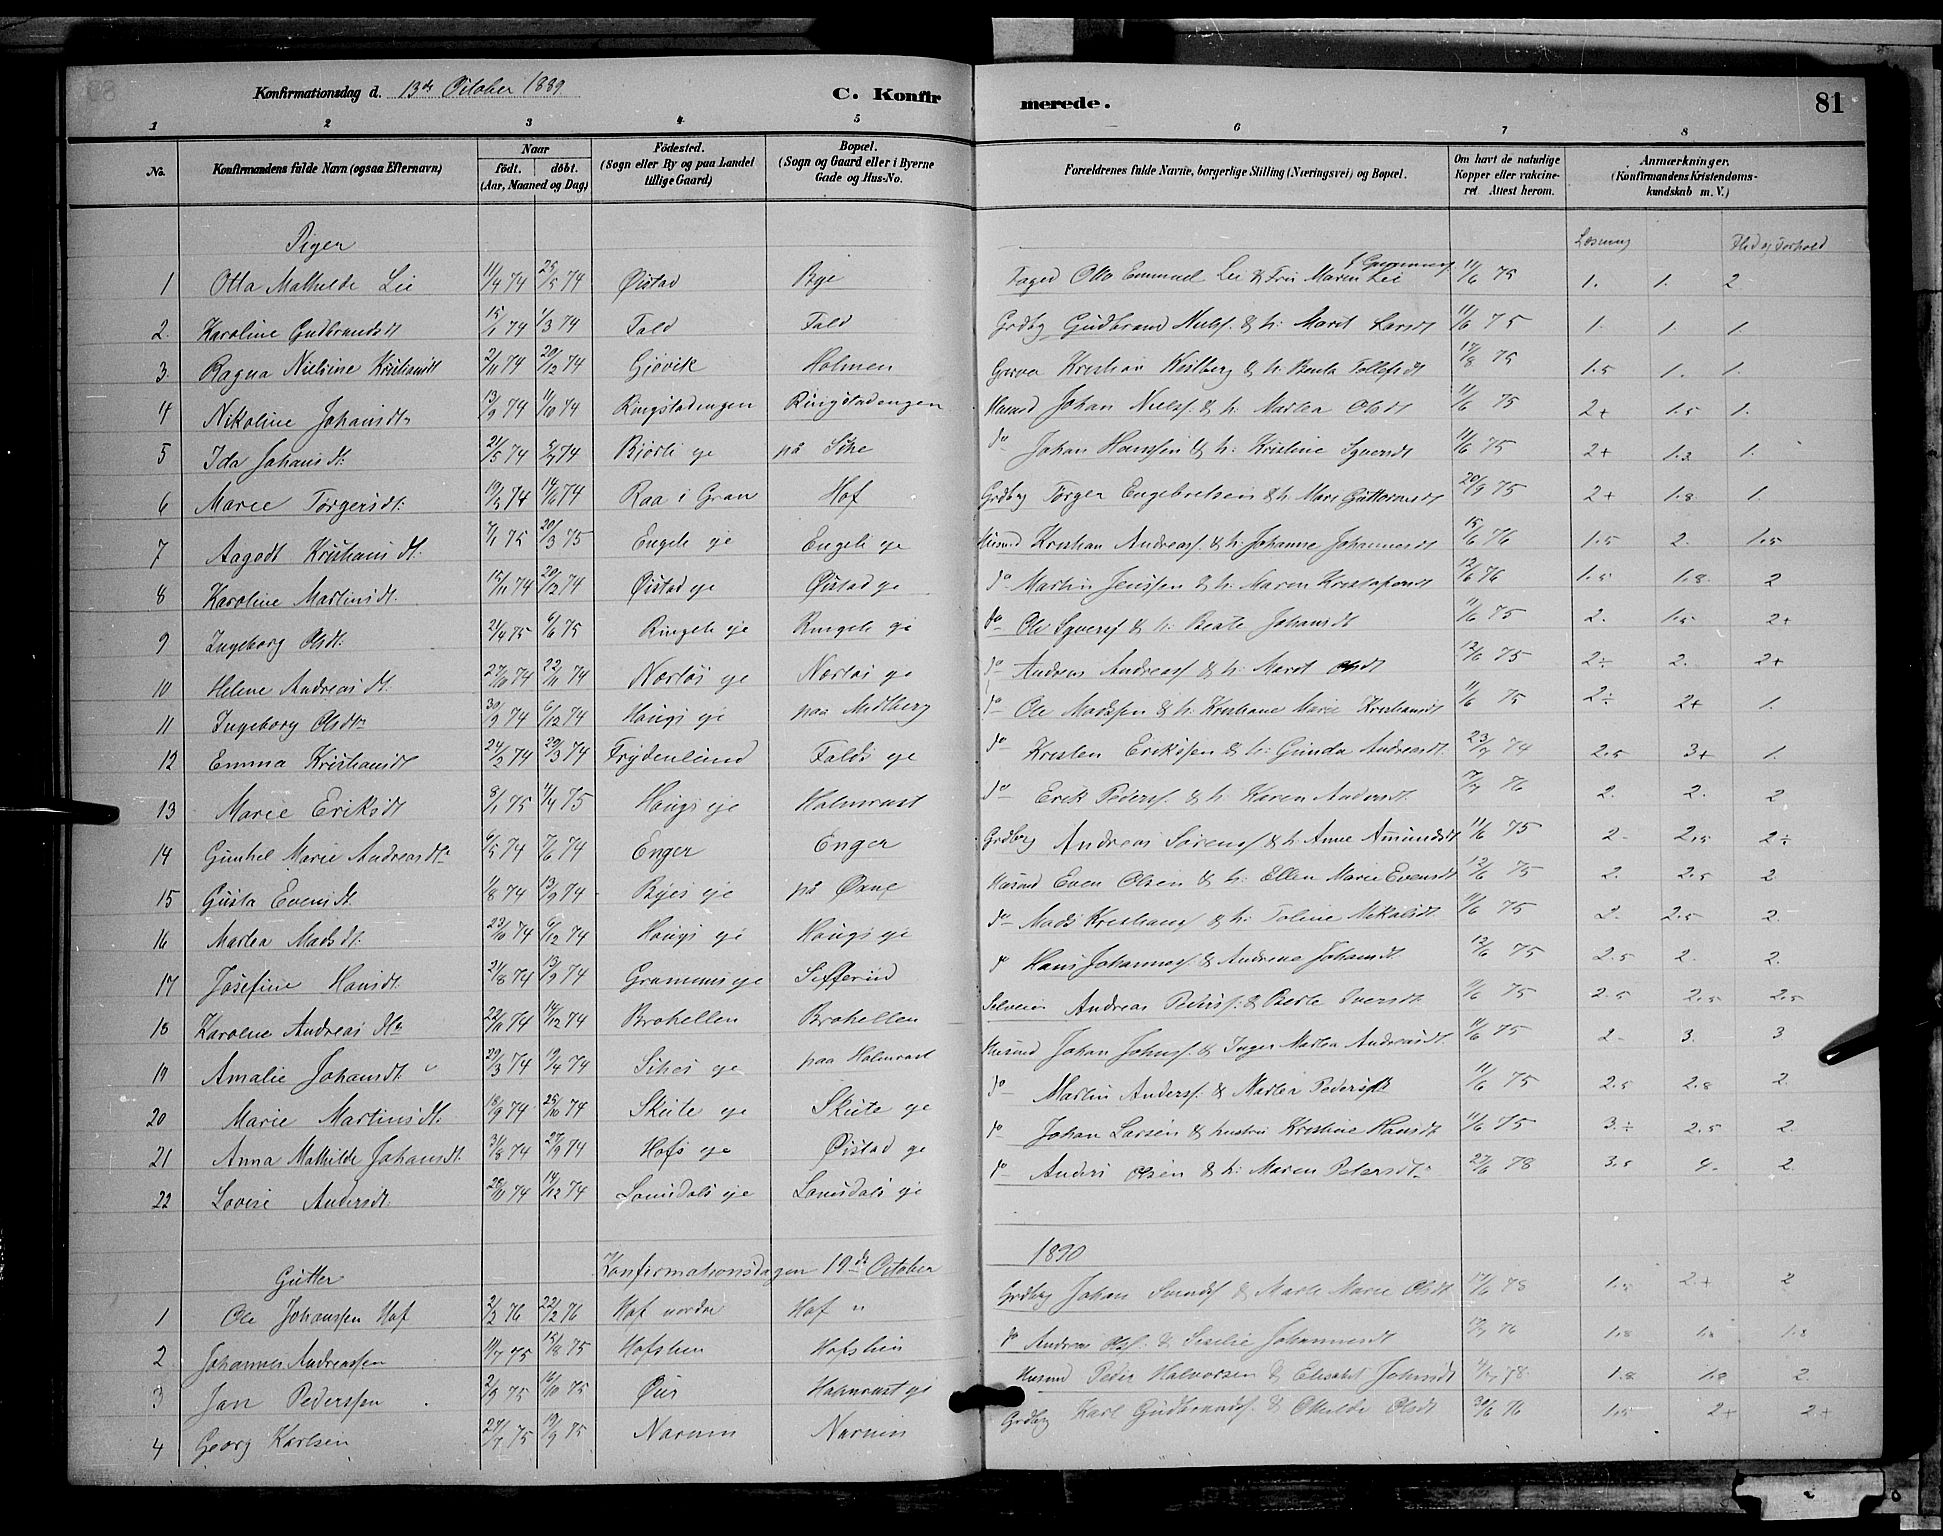 SAH, Søndre Land prestekontor, L/L0002: Klokkerbok nr. 2, 1884-1900, s. 81